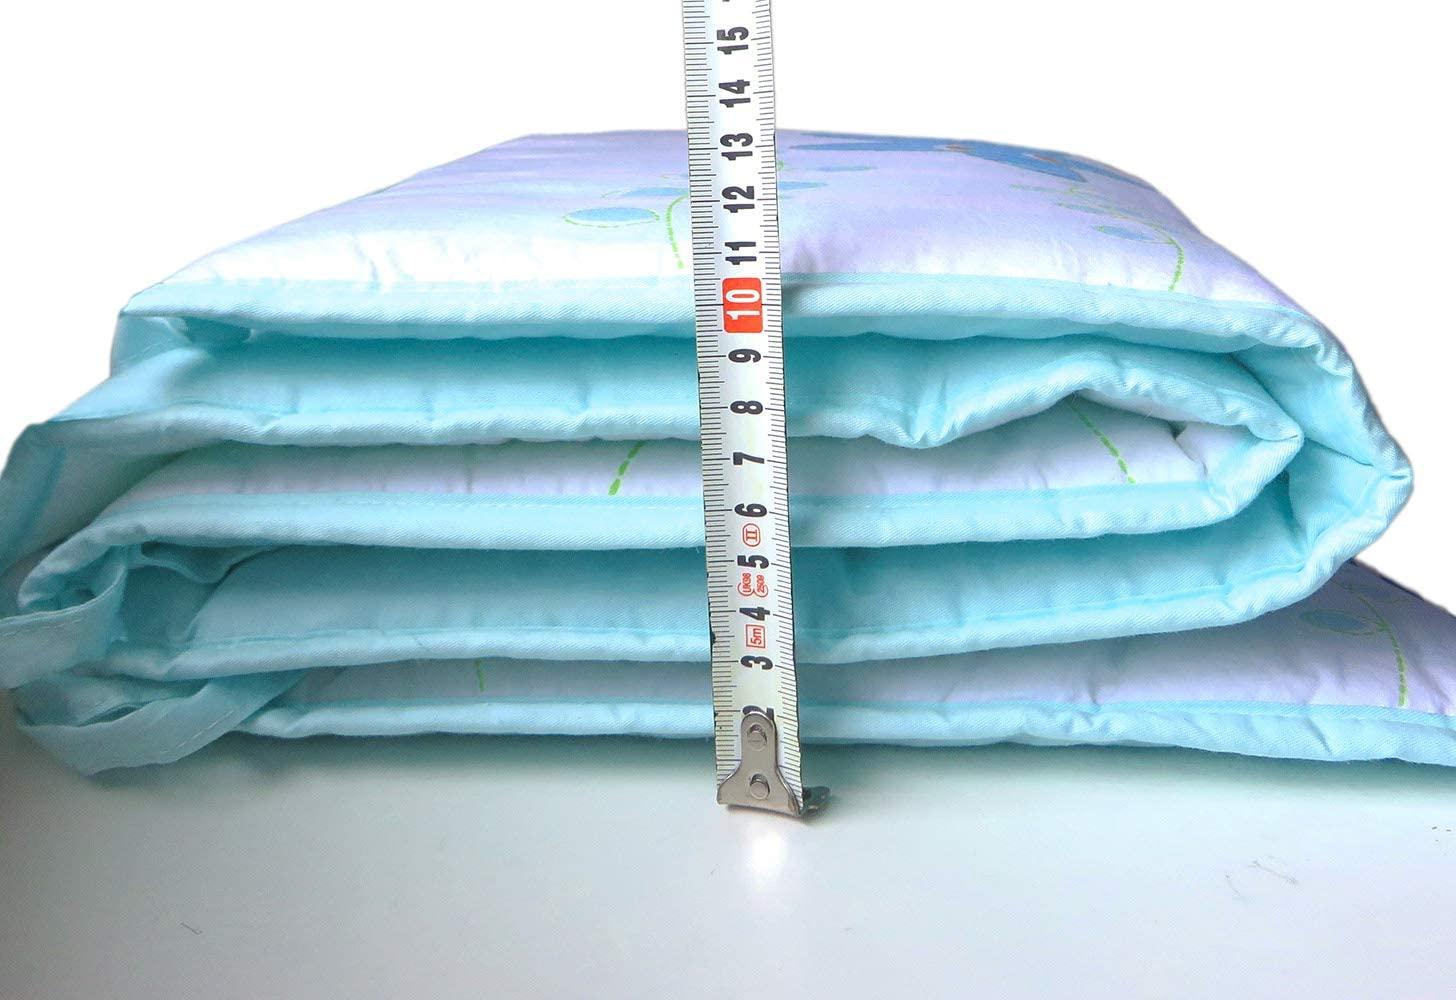 Protector cabeza cuna - Chichonera Bebé 100% algodón 30 x 180 cm (Océano)